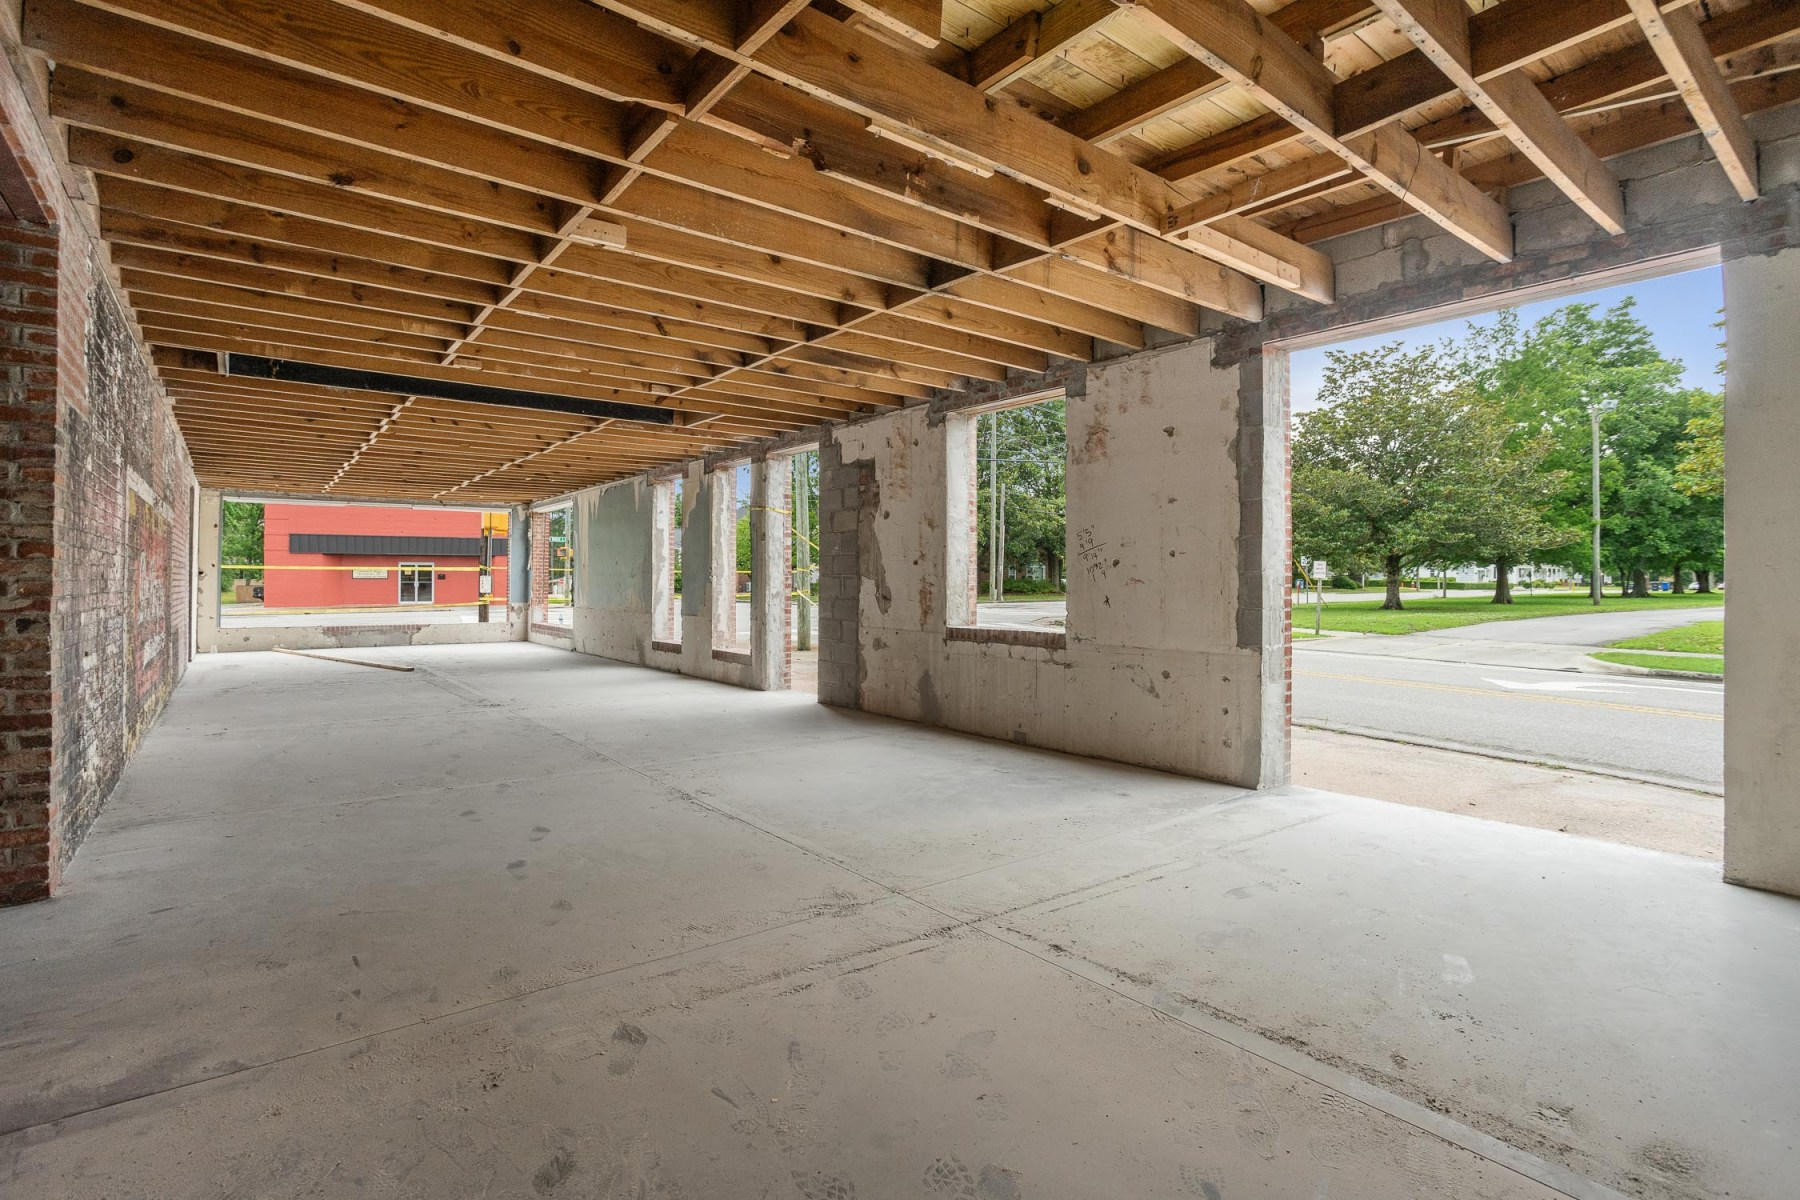 503-New-Bridge-St-Construction-3-25Jun2021_SB_04373_web-size